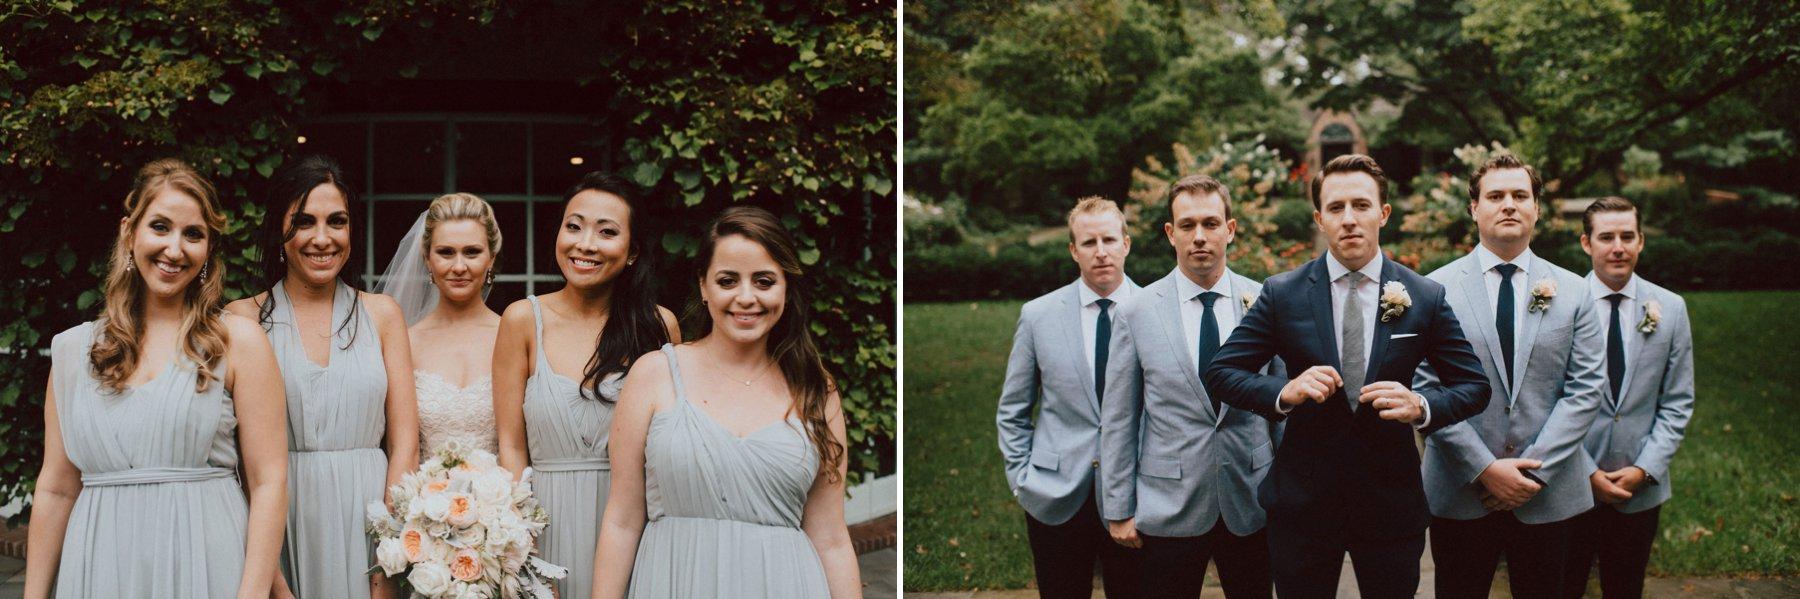 greenville-country-club-wedding-101.jpg